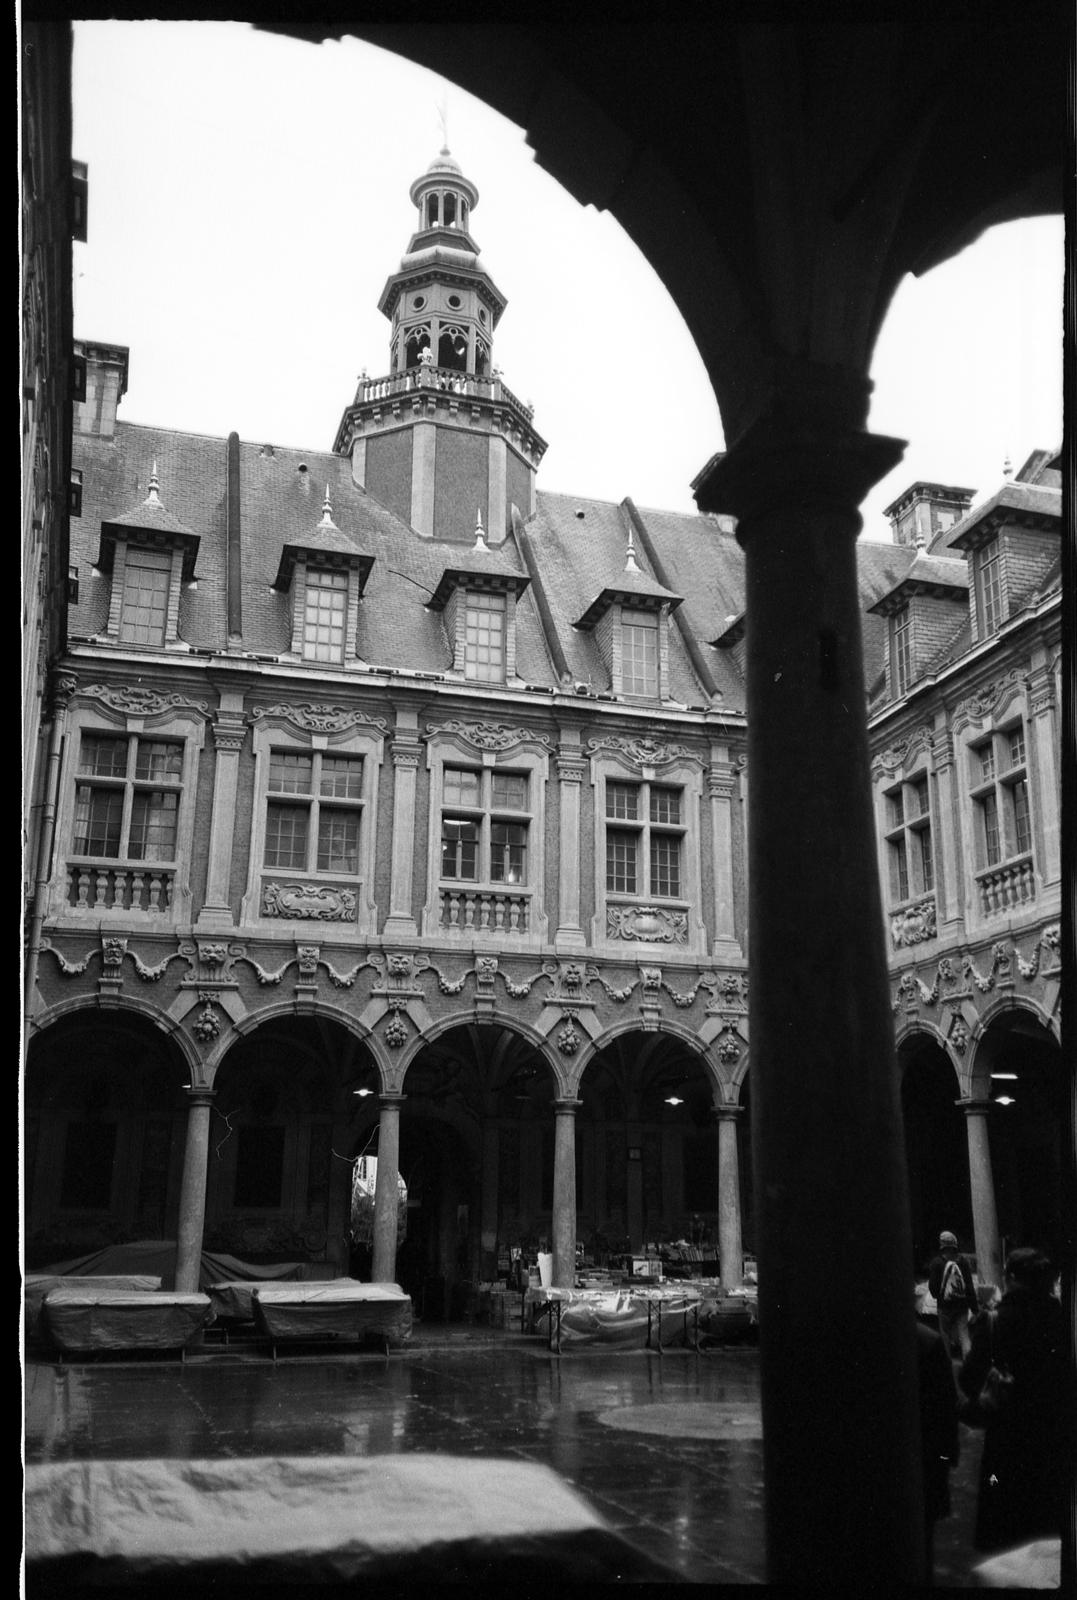 Lille - La Vieille Bourse - MJU II - Kodak TMAX 400